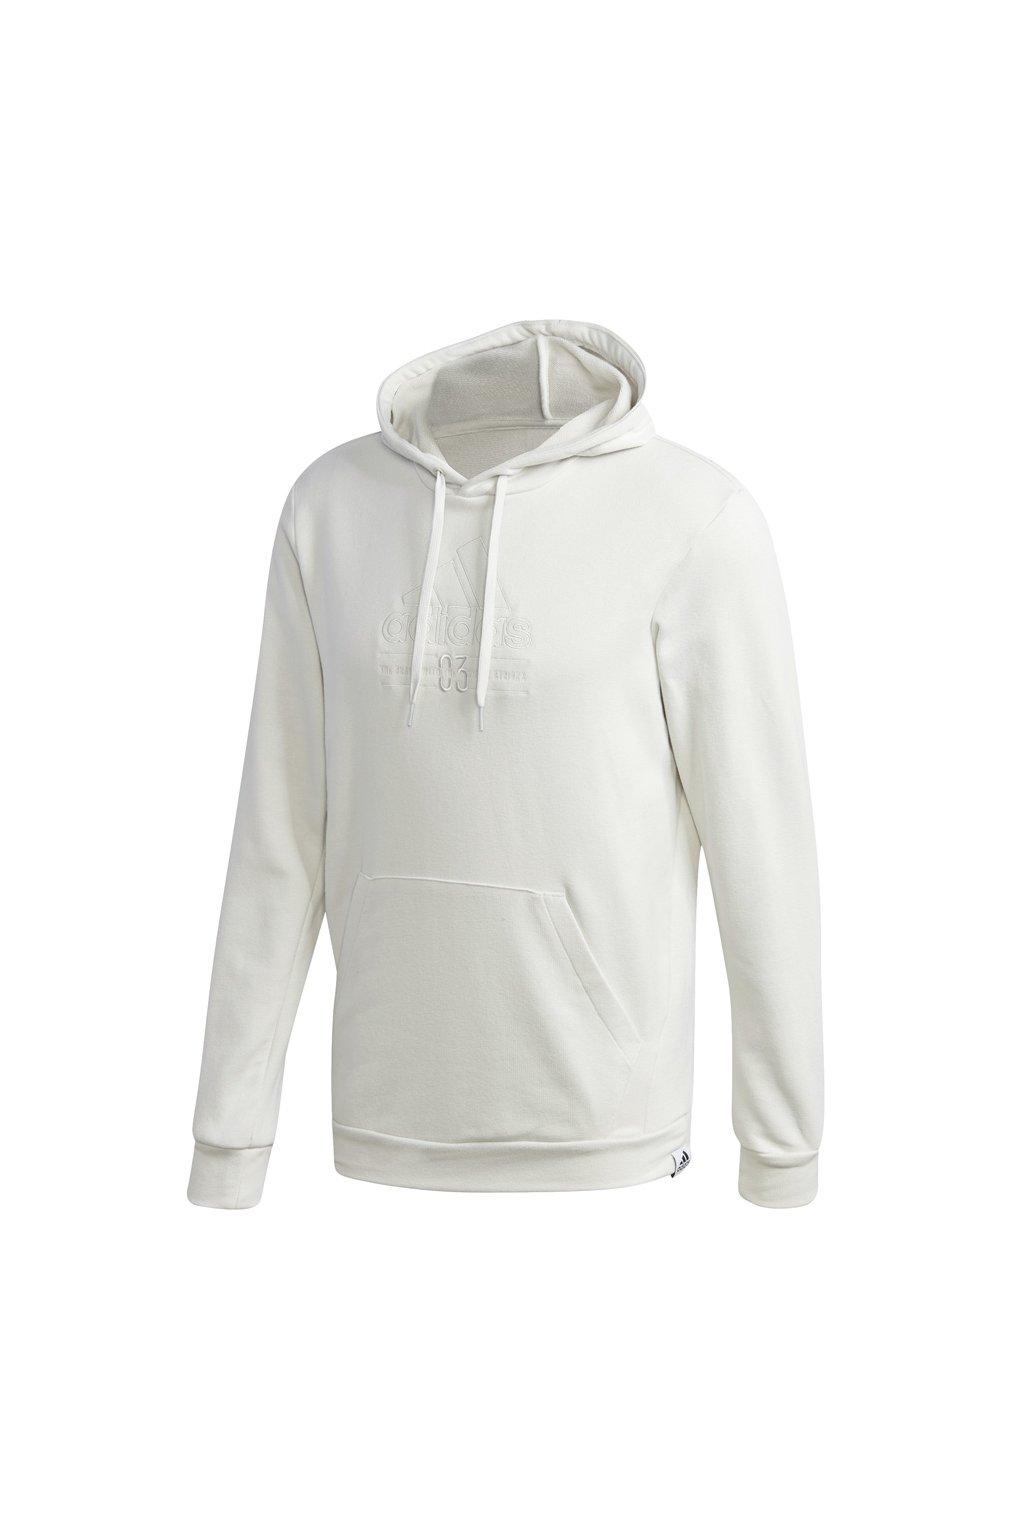 Pánska mikina adidas Brilliant Basics Hooded biela GD3833